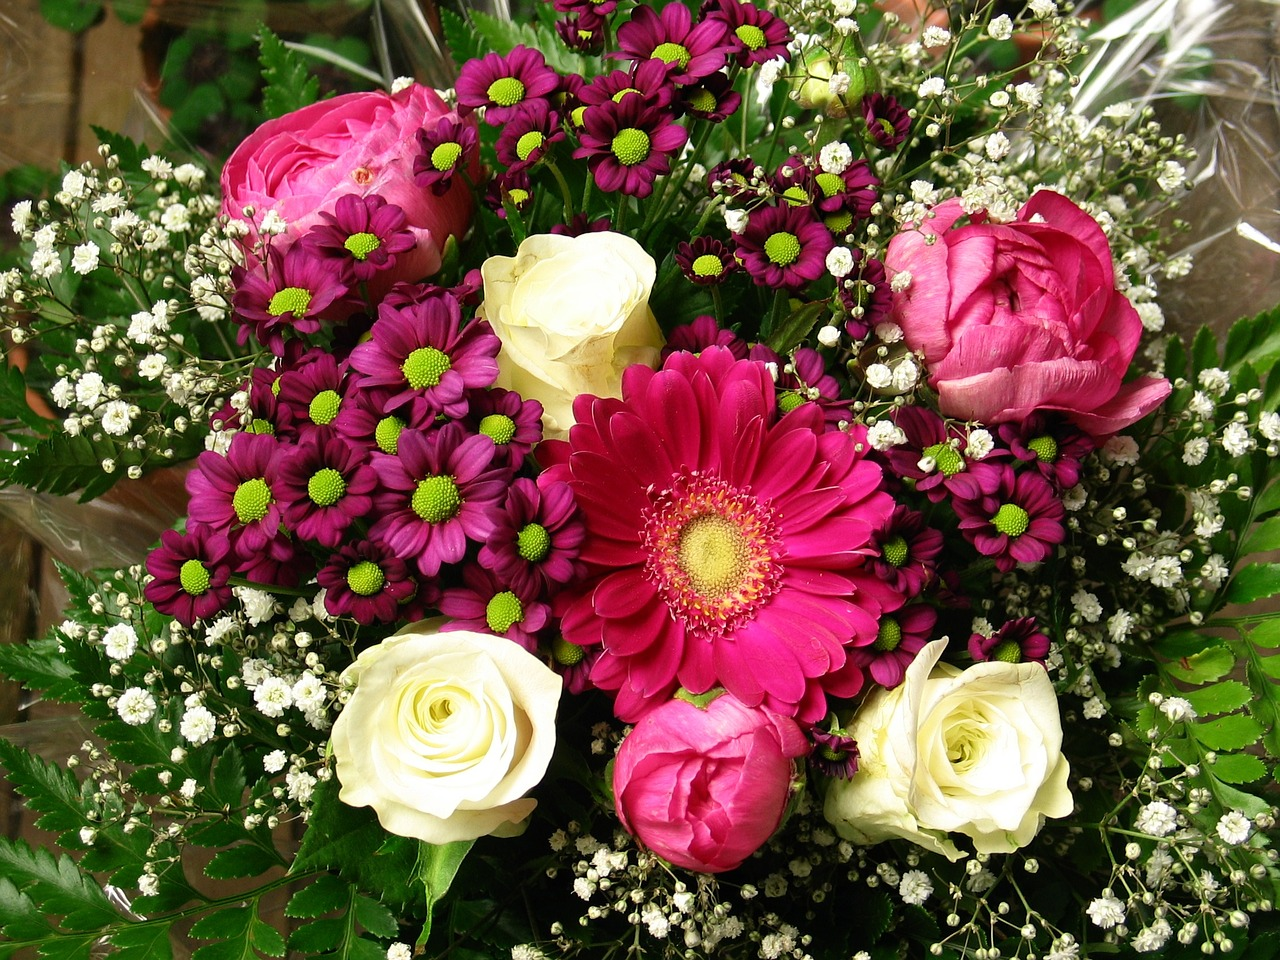 Tips for Sending Birthday Flowers to Your Boyfriend